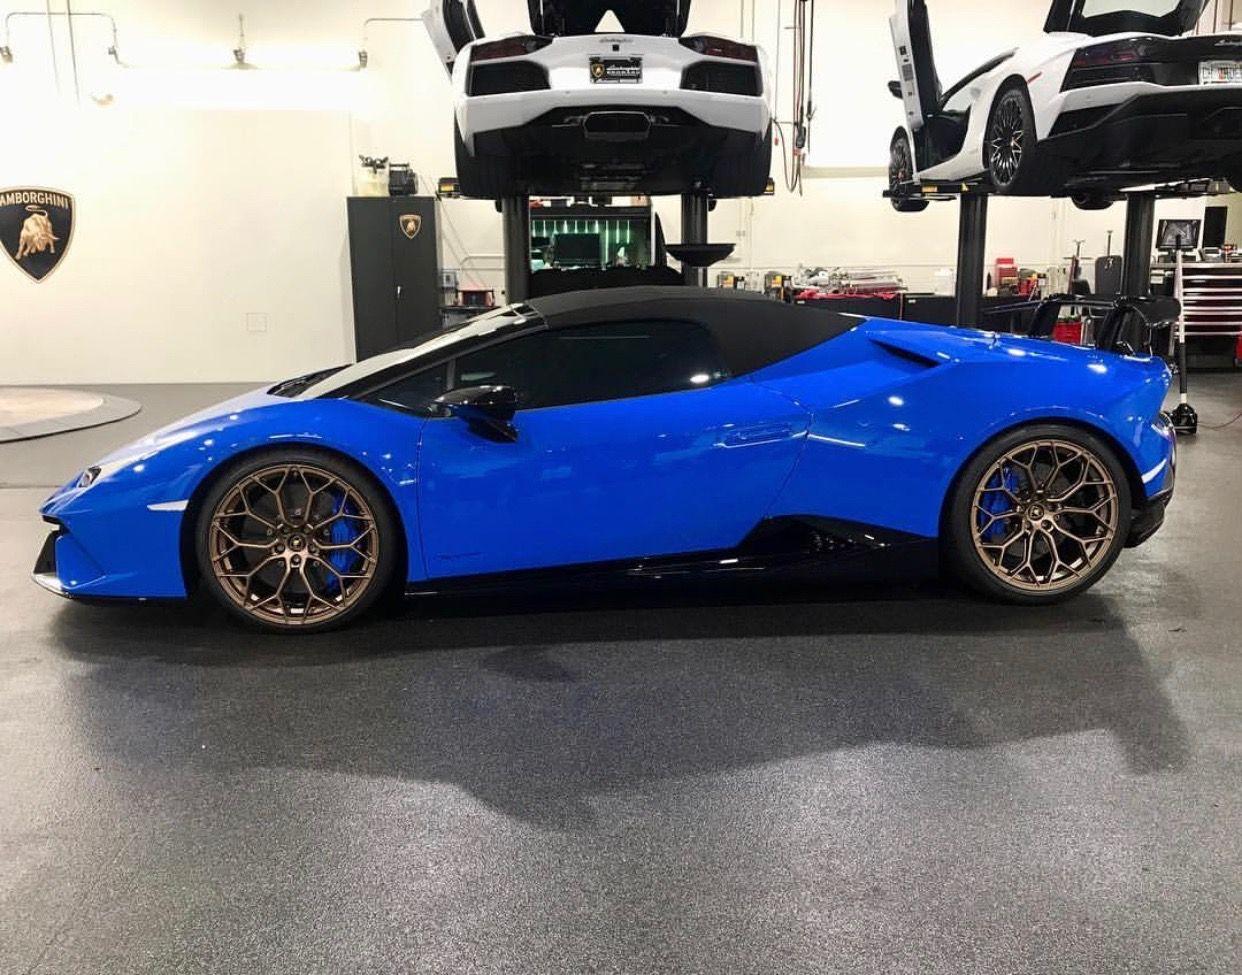 Lamborghini Huracan Performante Spyder Painted In Blu Le